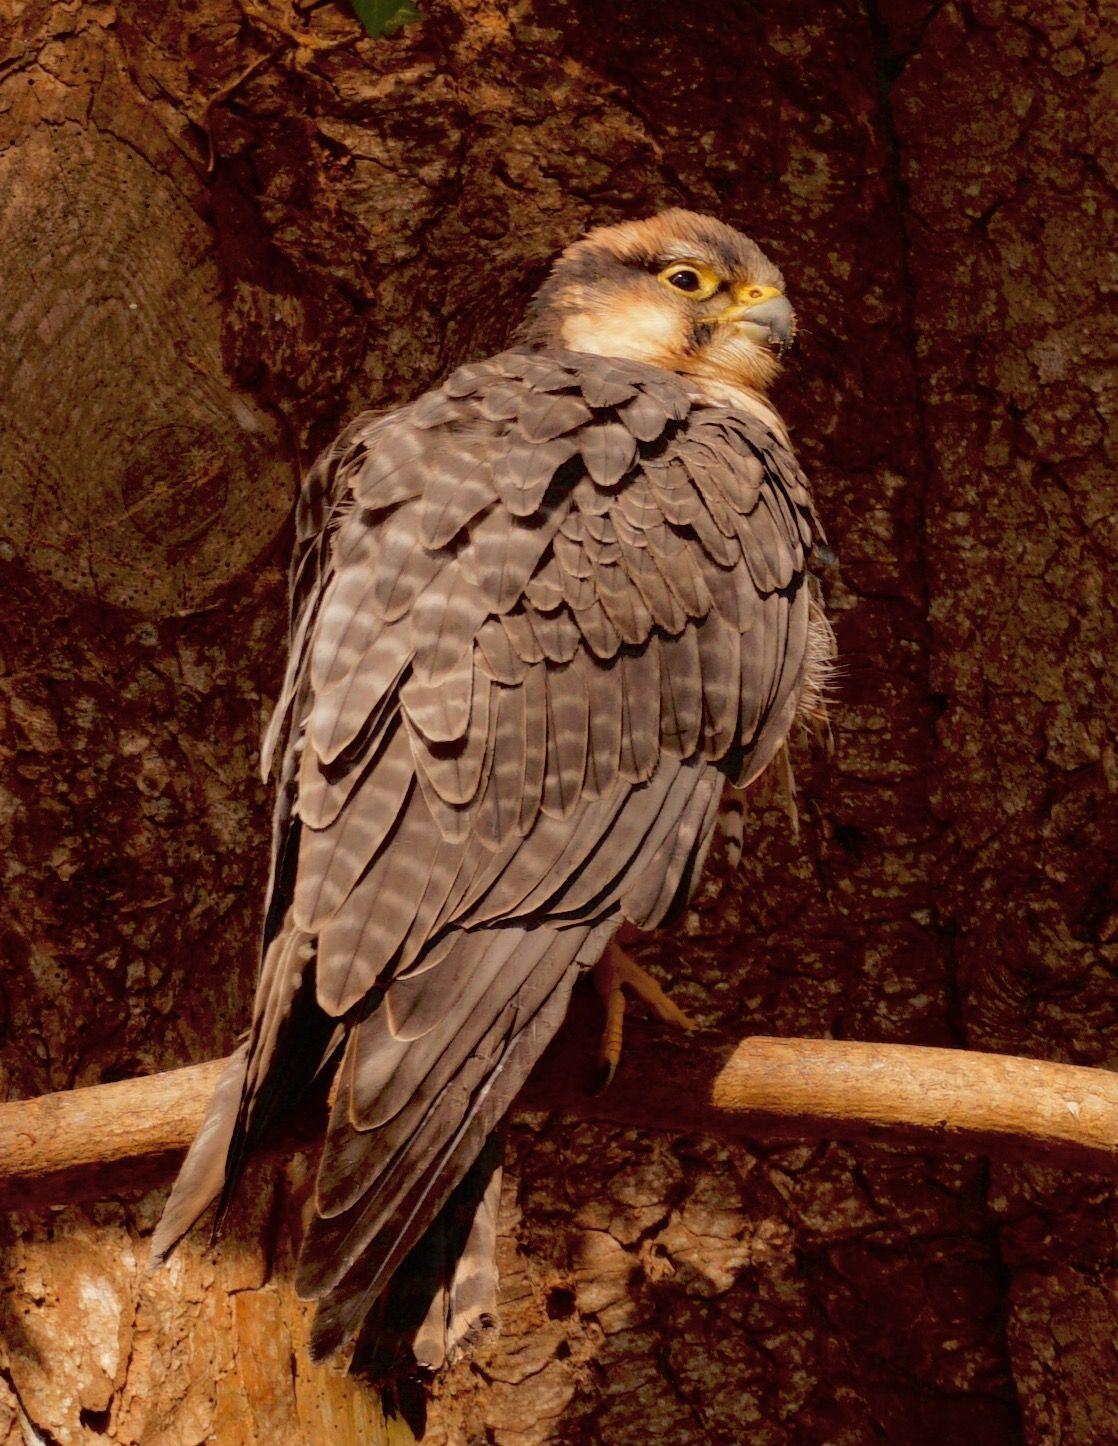 Ruffled feathers - Sony Ruffled Feathers